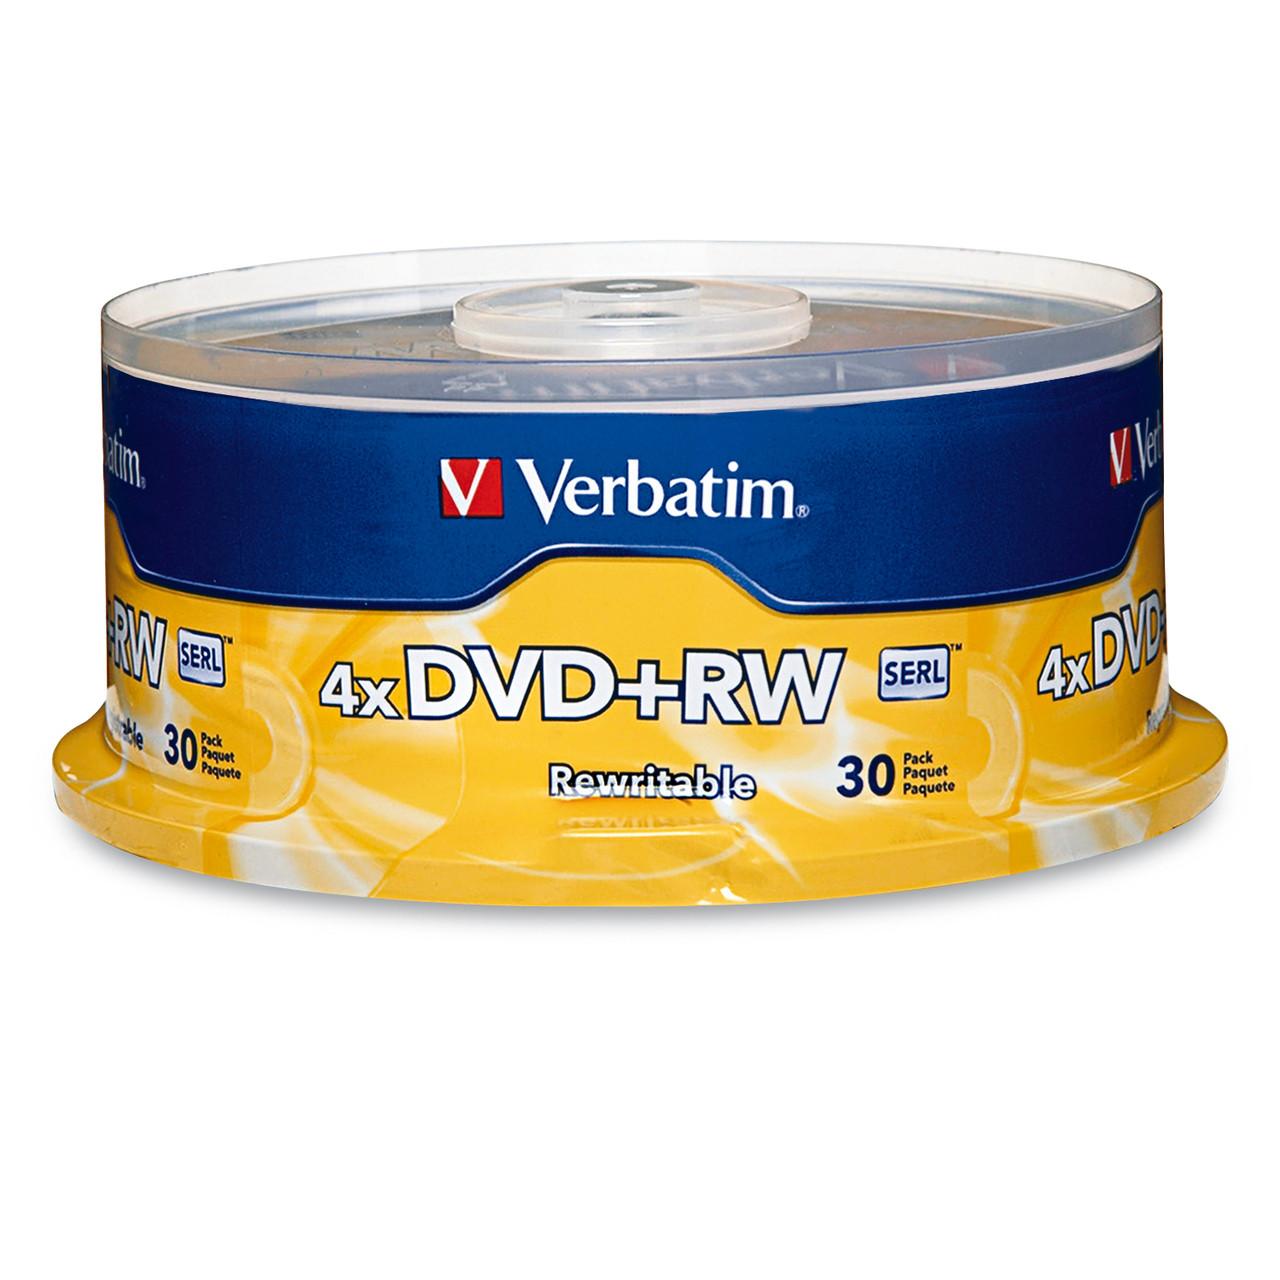 Verbatim DVD+RW - 4.7GB 4X Spindle (6 Pack of 30 Pieces)